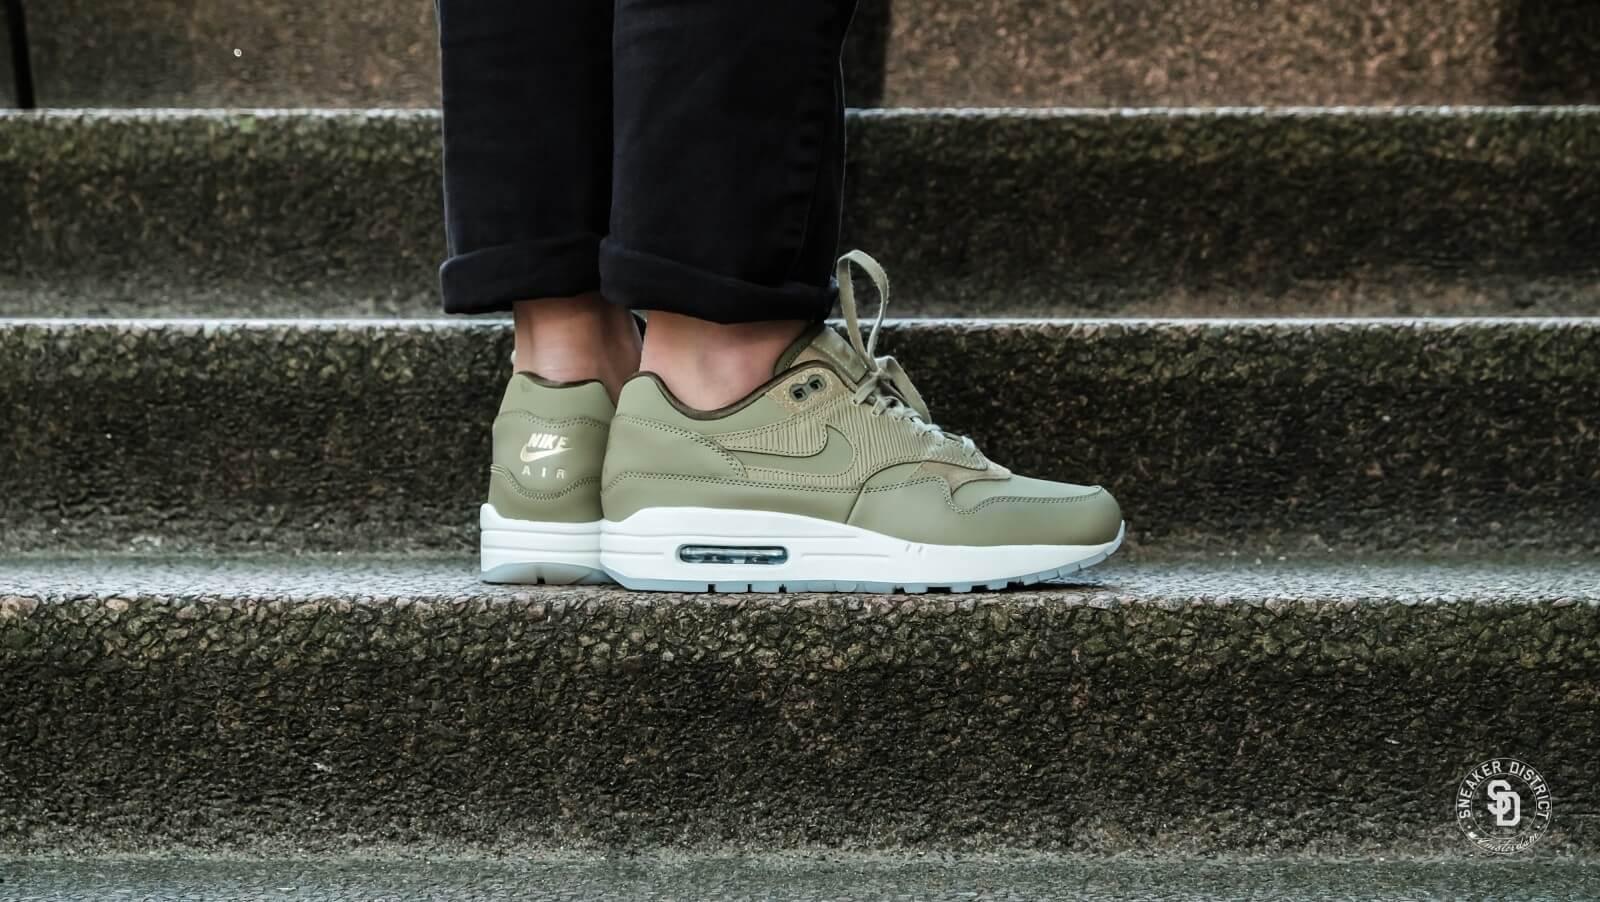 Nike Air Max 1 Premium Neutral OliveMedium Olive Sneakers